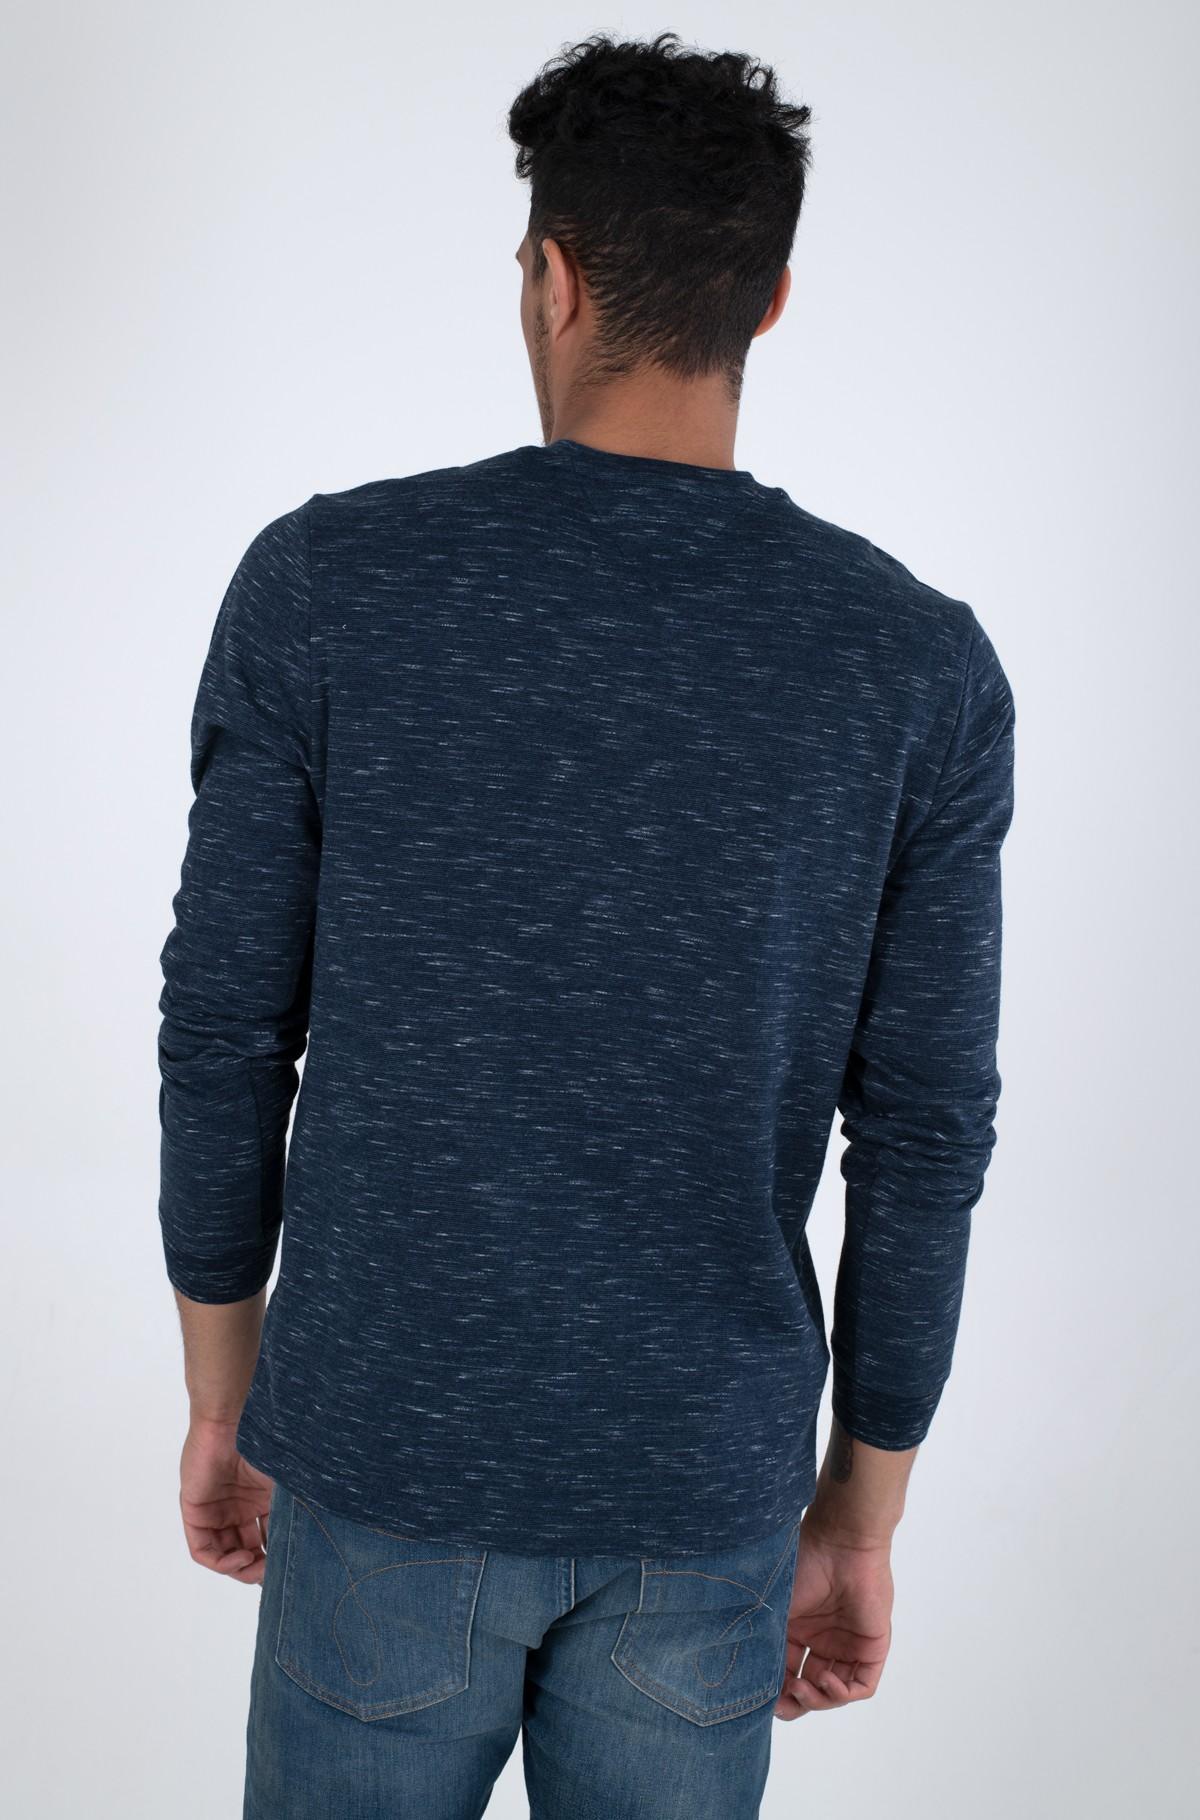 T-krekls ar garām piedurknēm  TJM CREW NECK SNIT-full-2